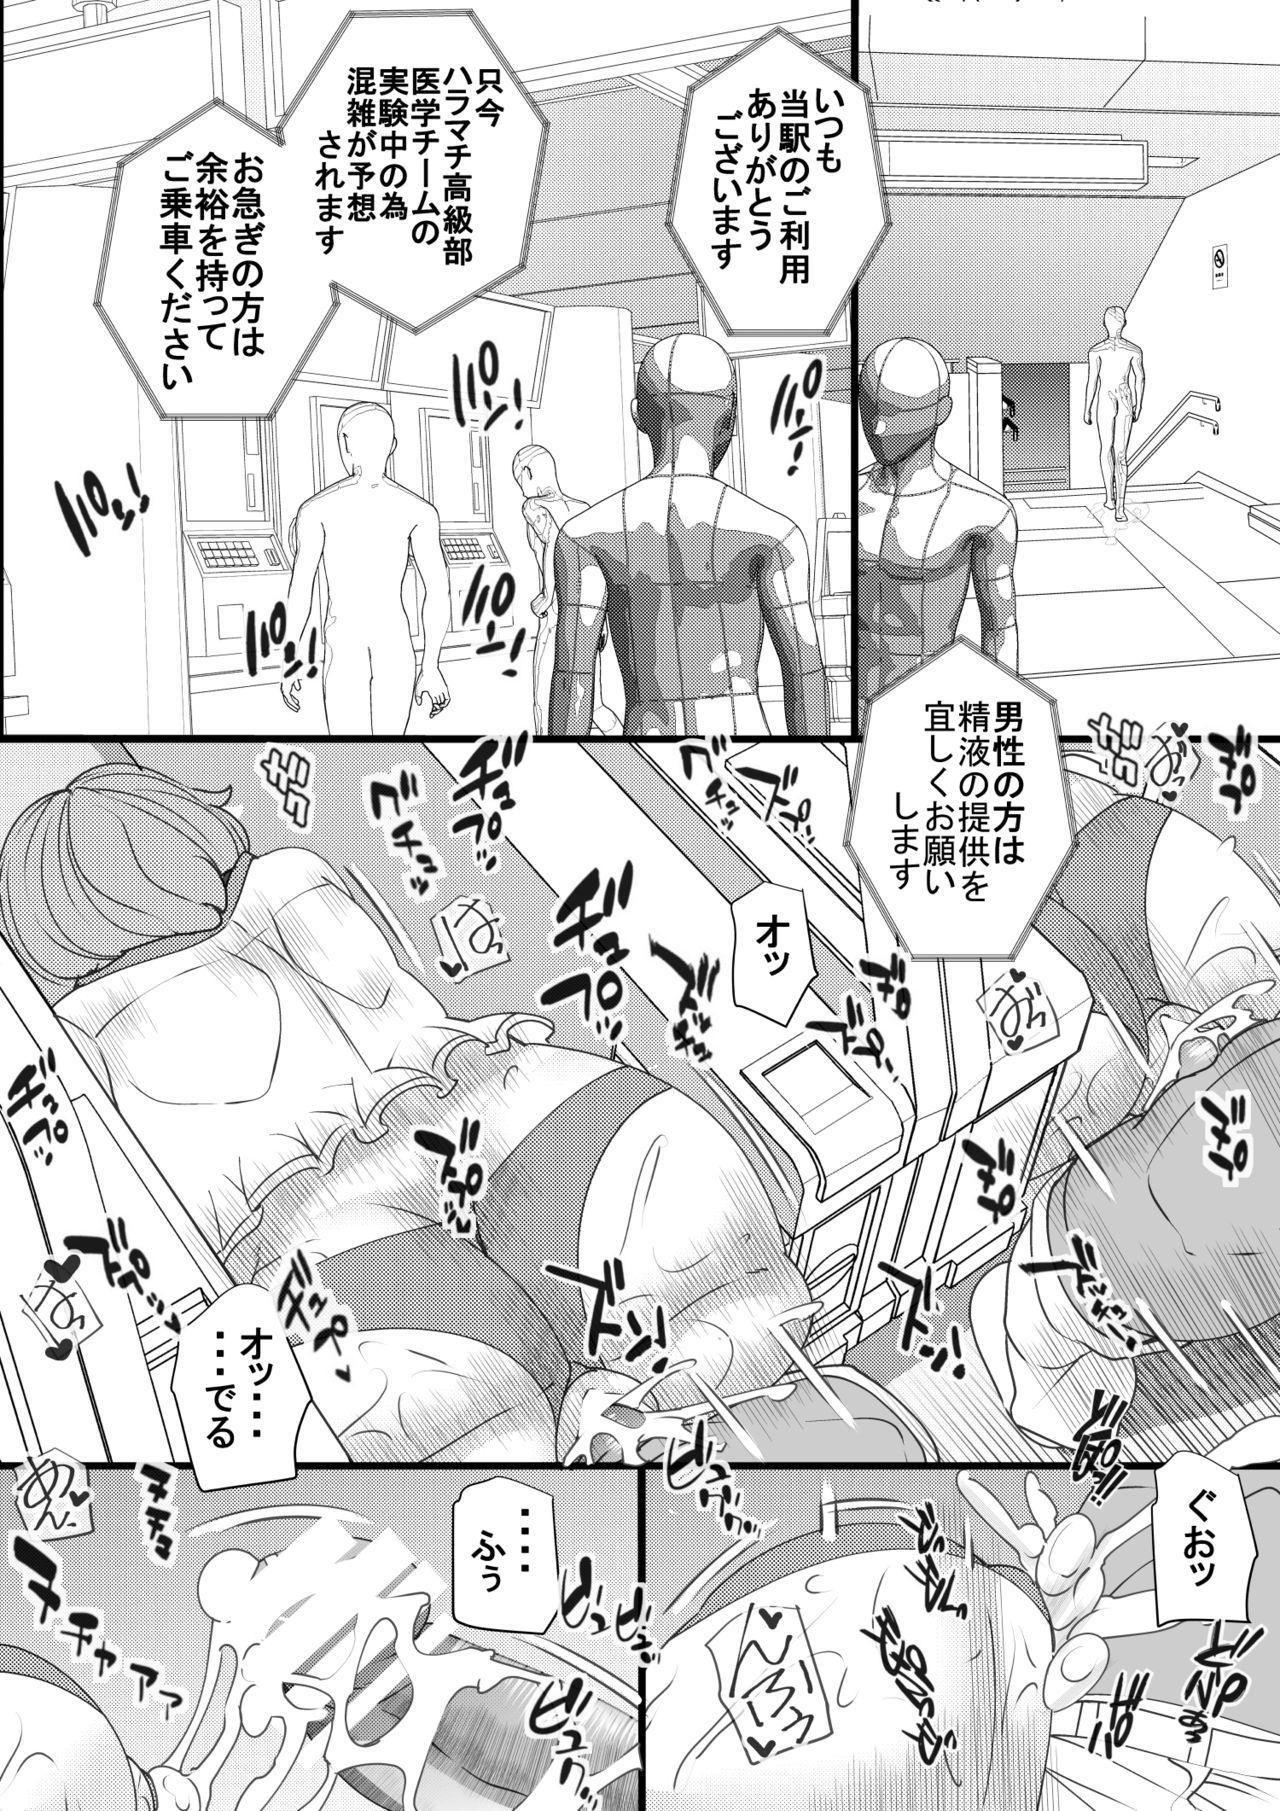 Haramachi 3 7